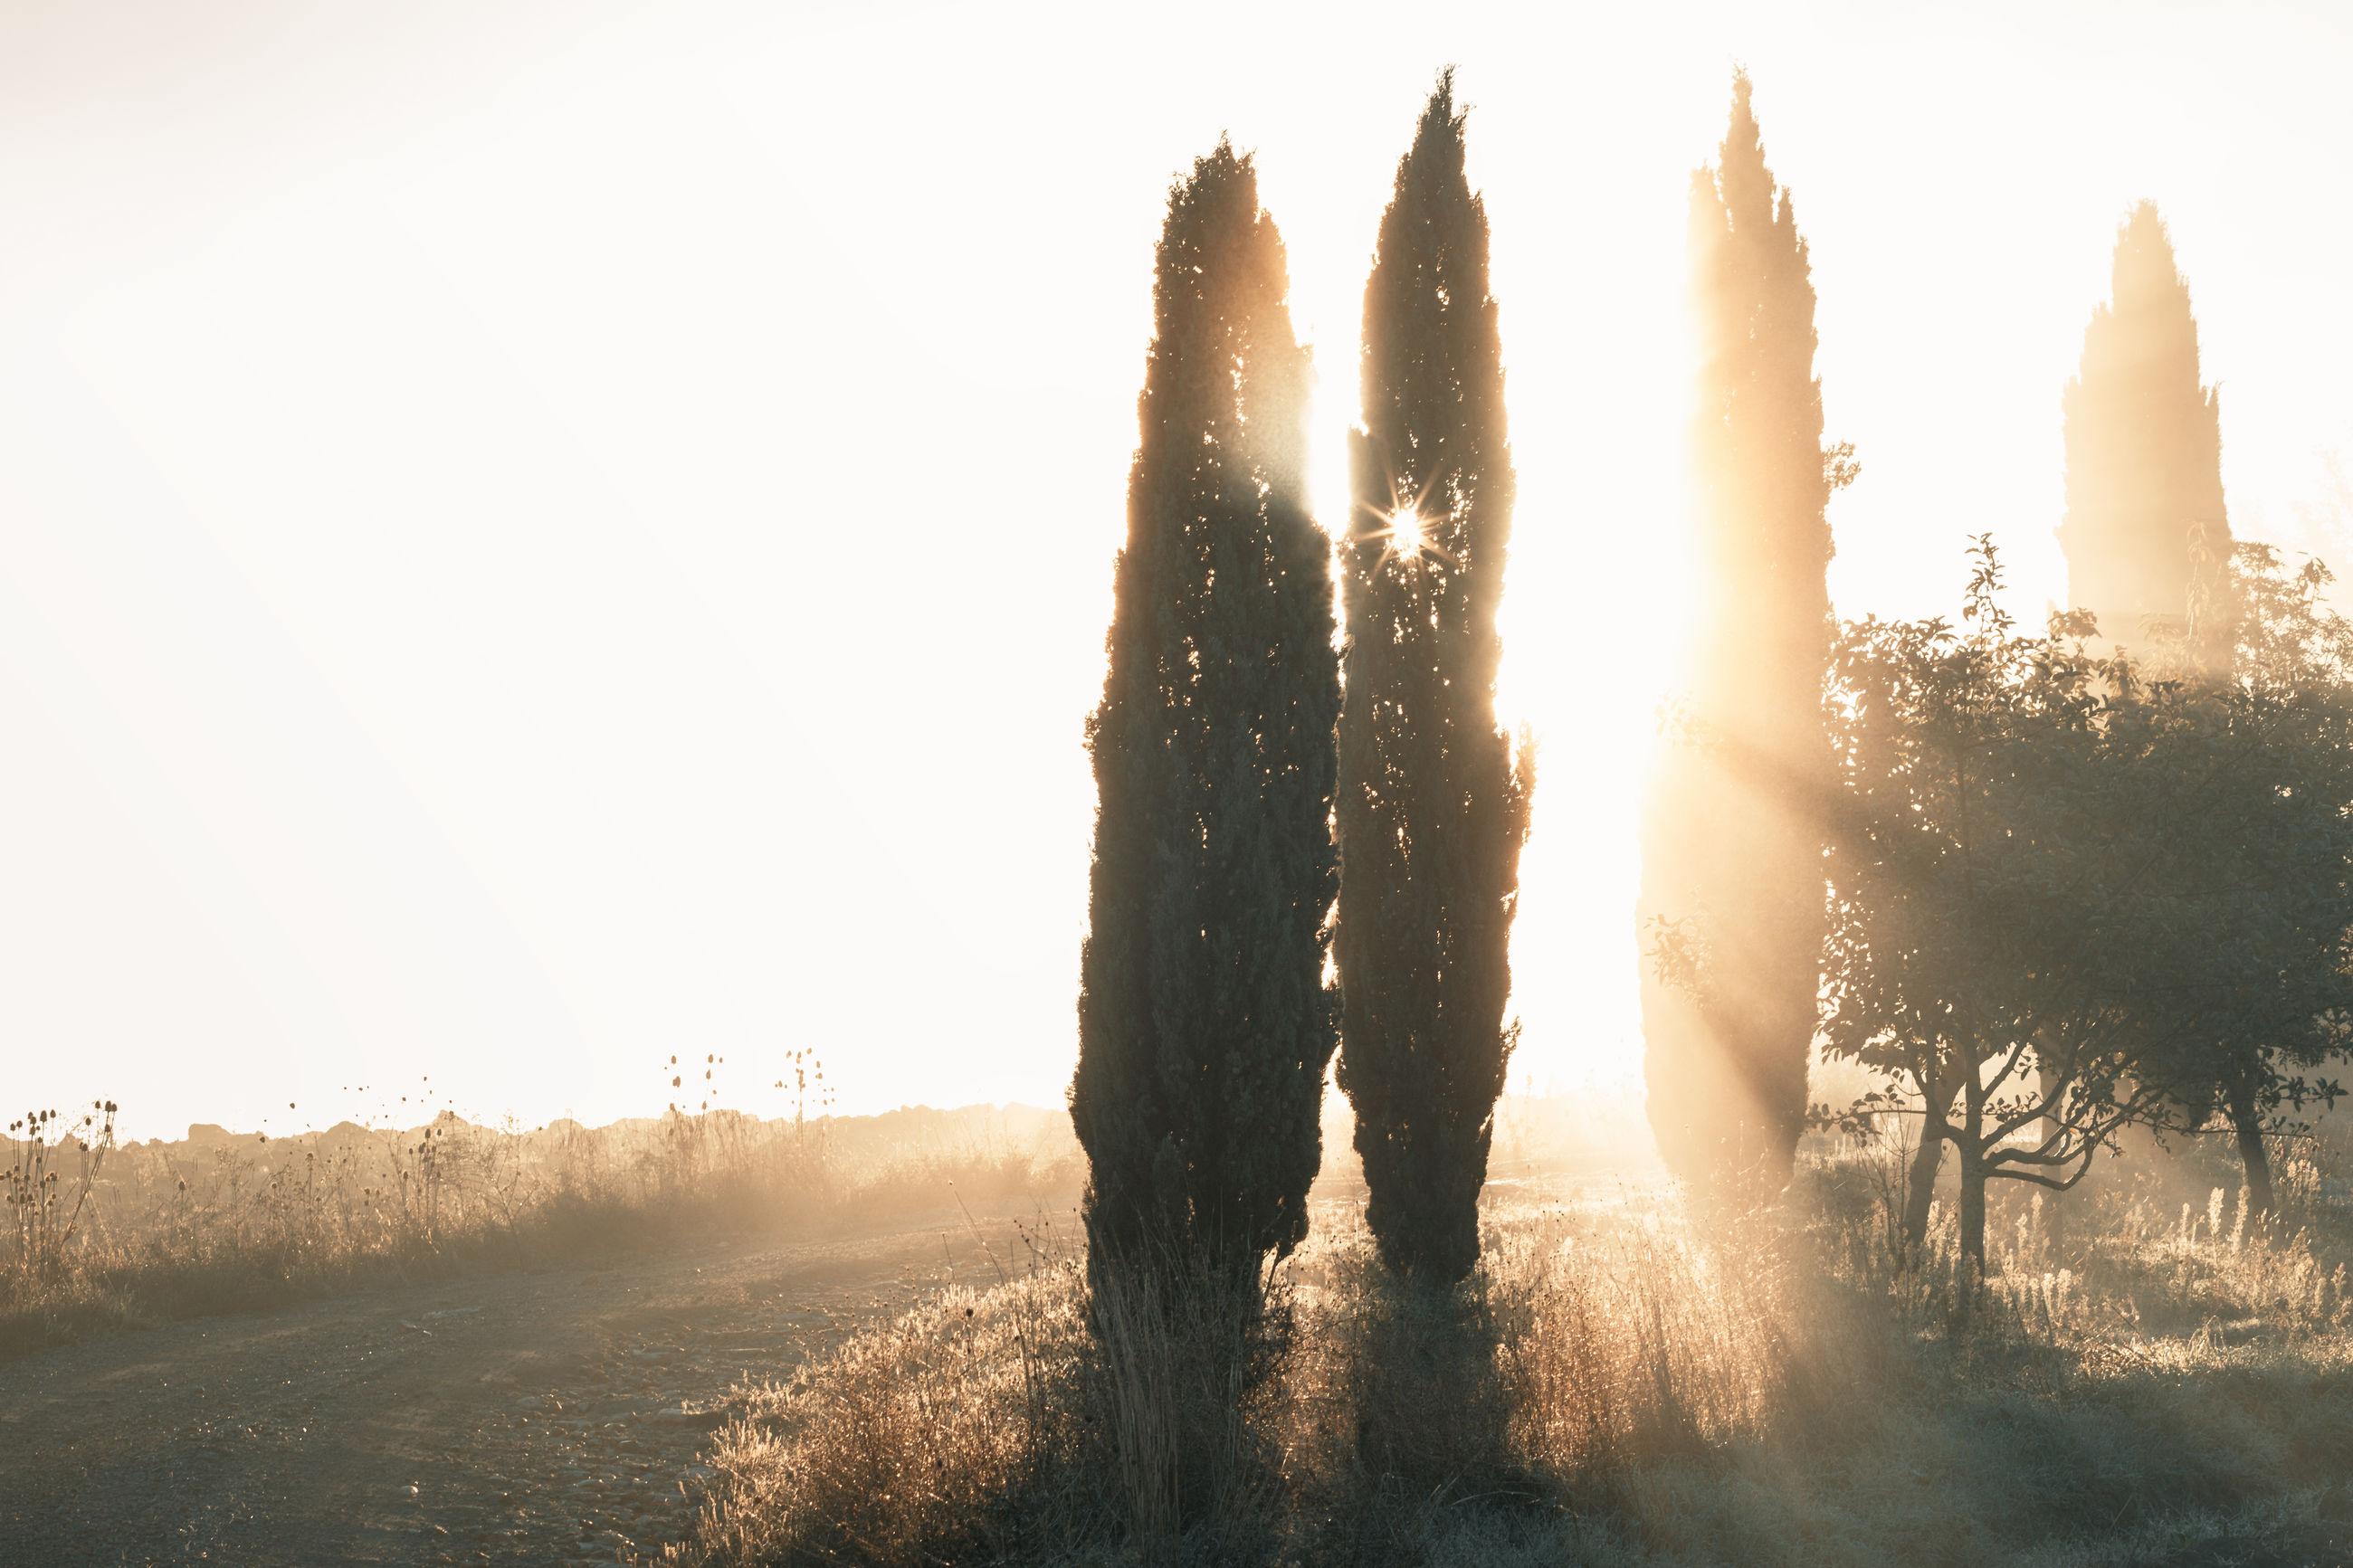 SUNLIGHT STREAMING THROUGH TREE ON FIELD AGAINST SKY